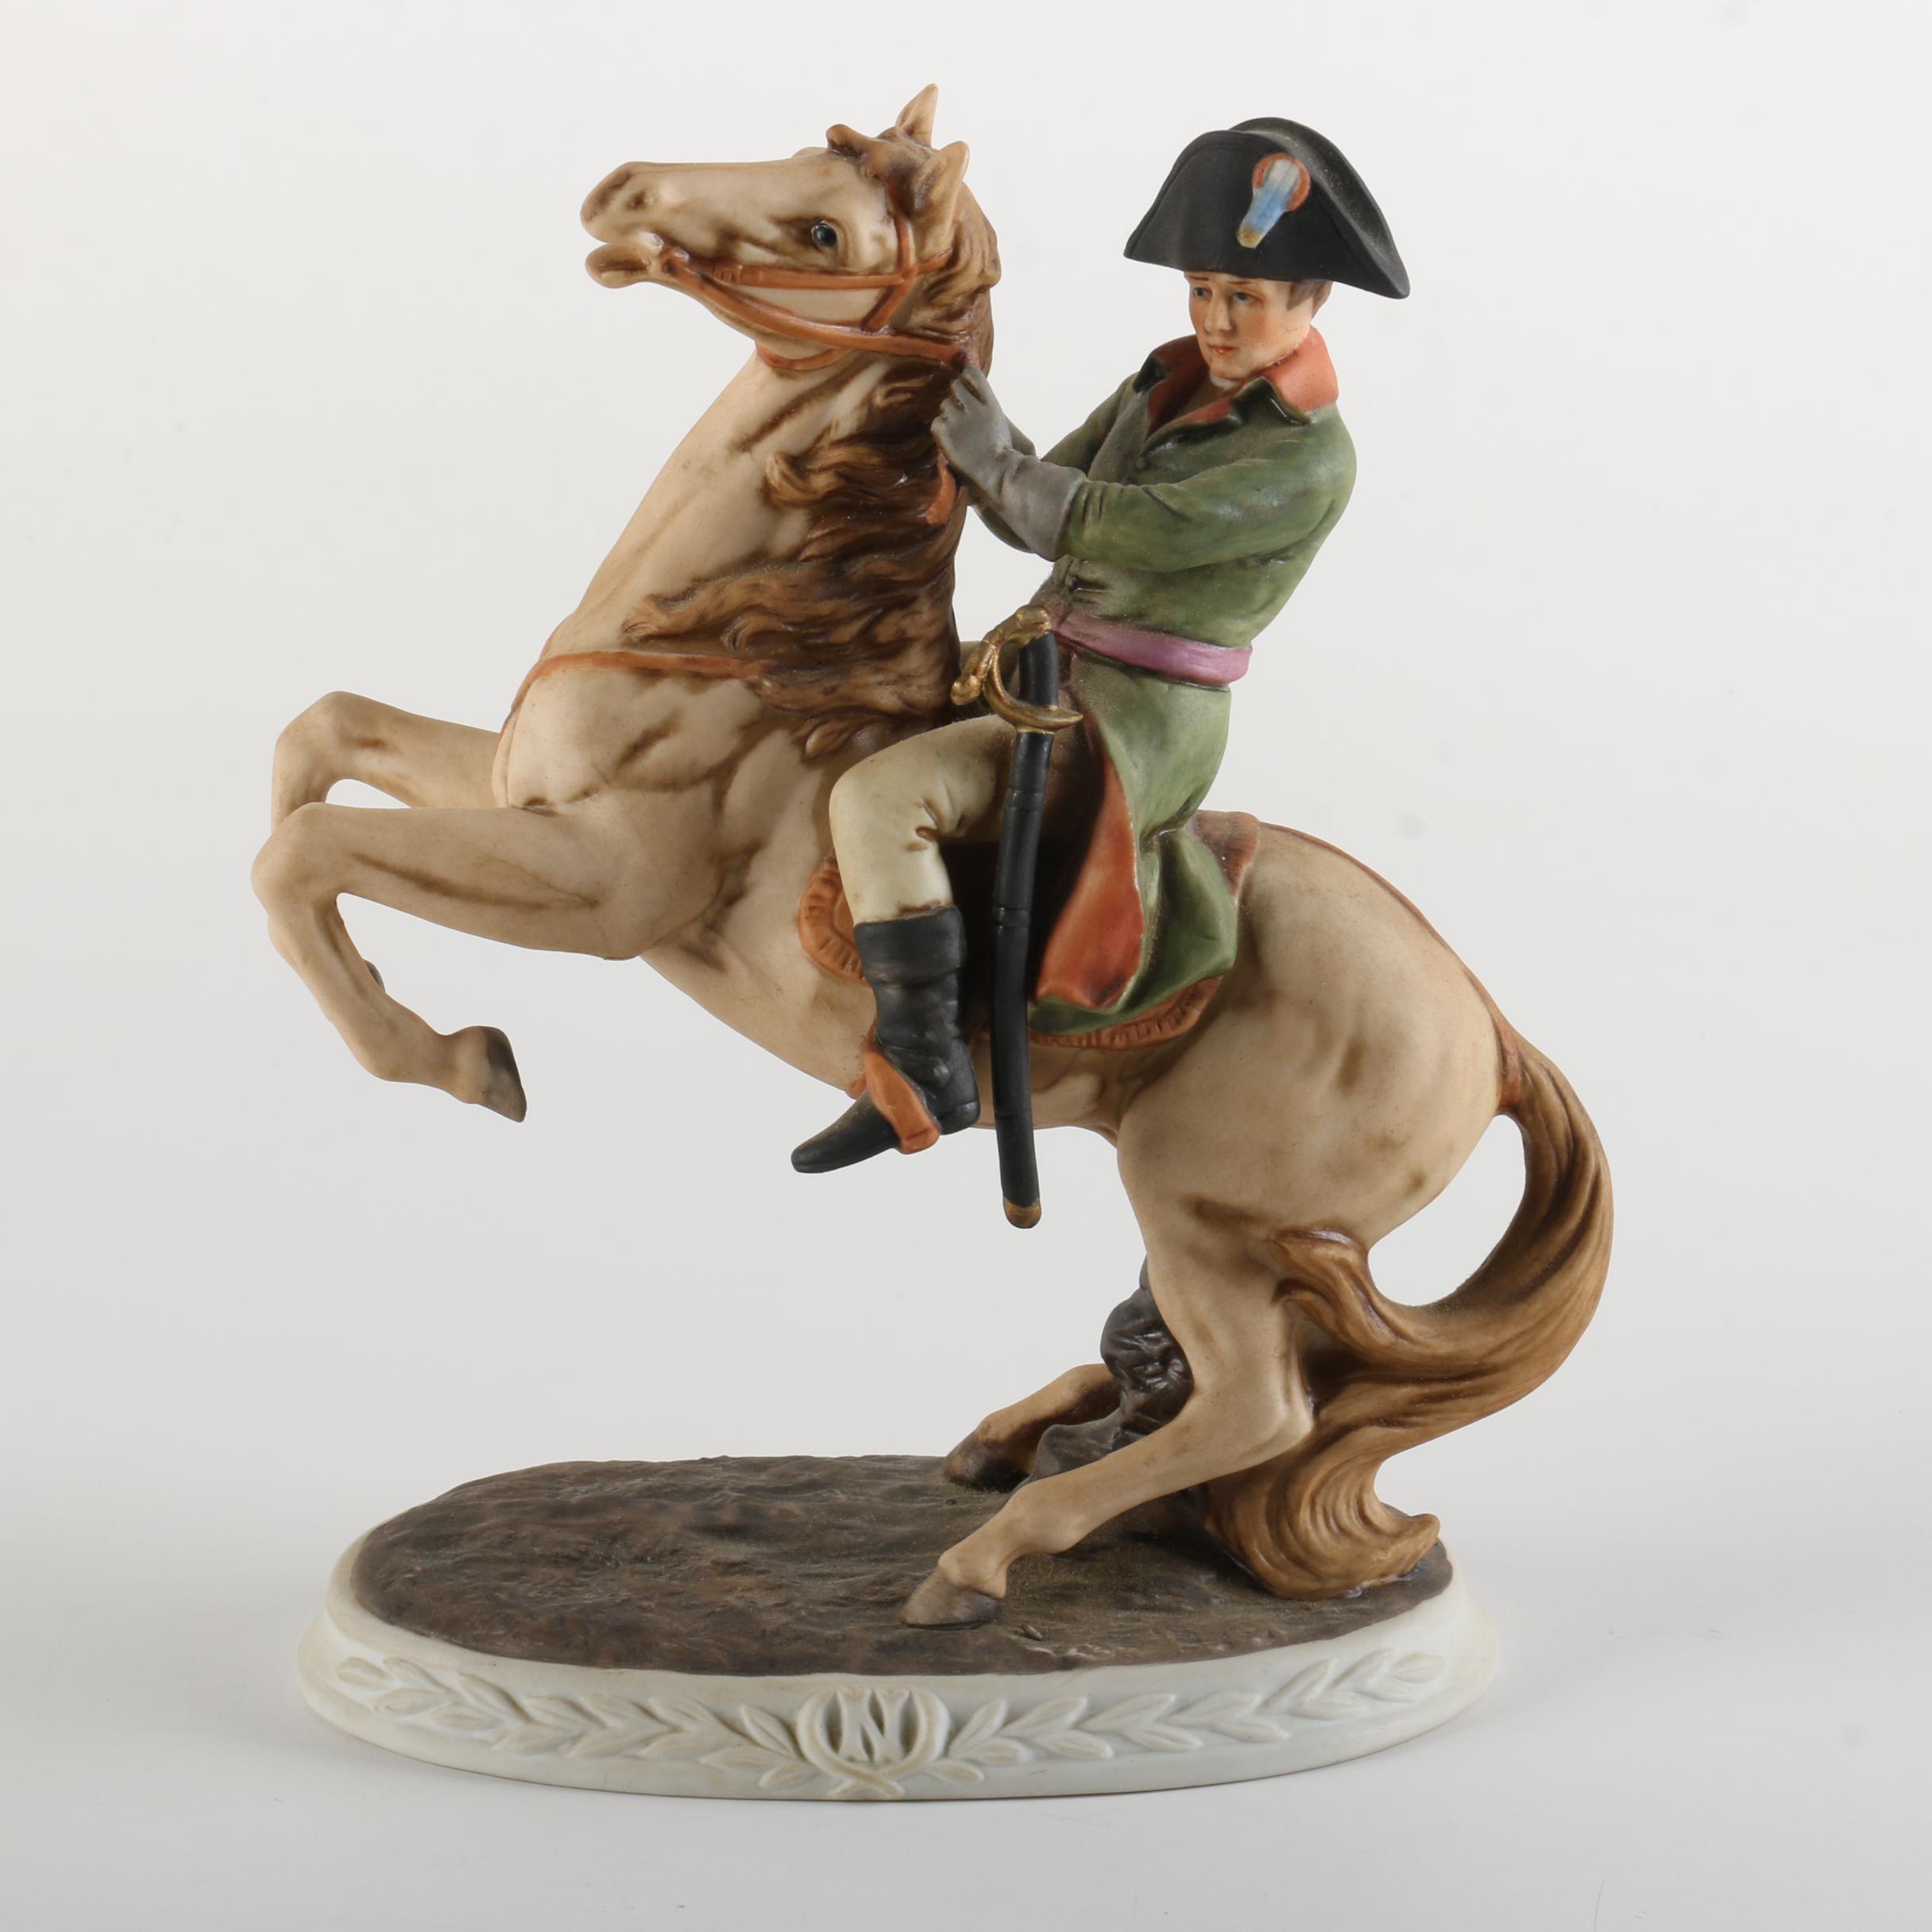 Marks and Rosenfield Porcelain Napoleon Figurine